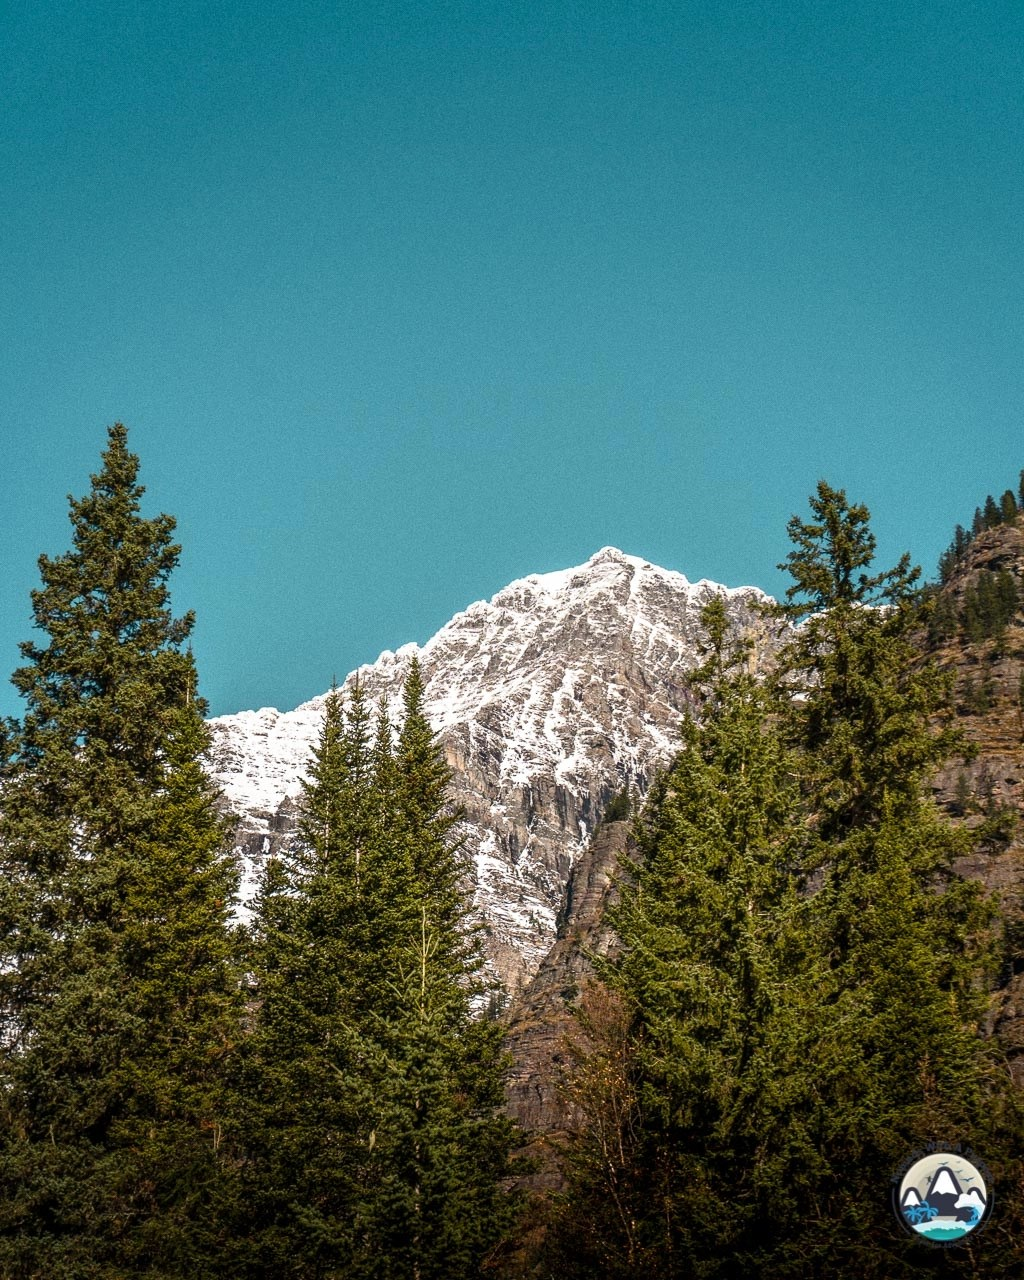 Avalanche Lake views in Glacier National Park